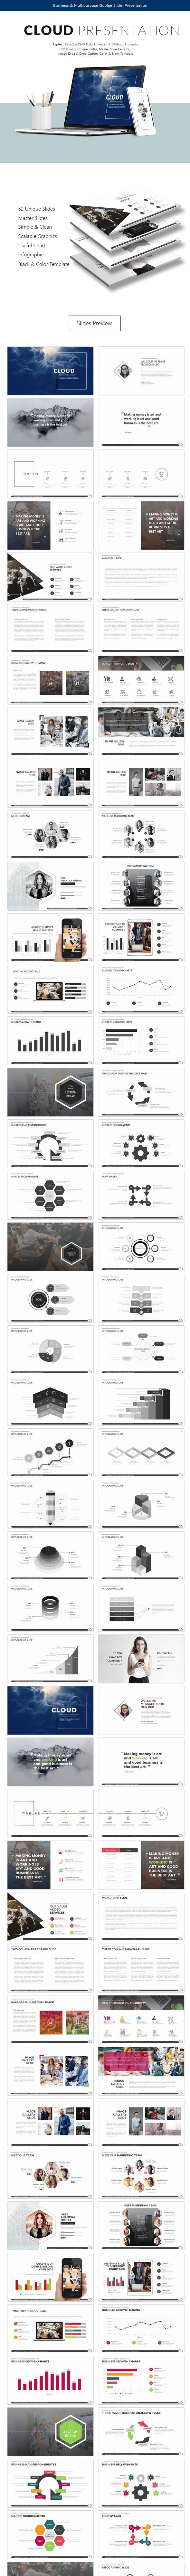 cloud google slide presentation template by slidoaspire graphicriver